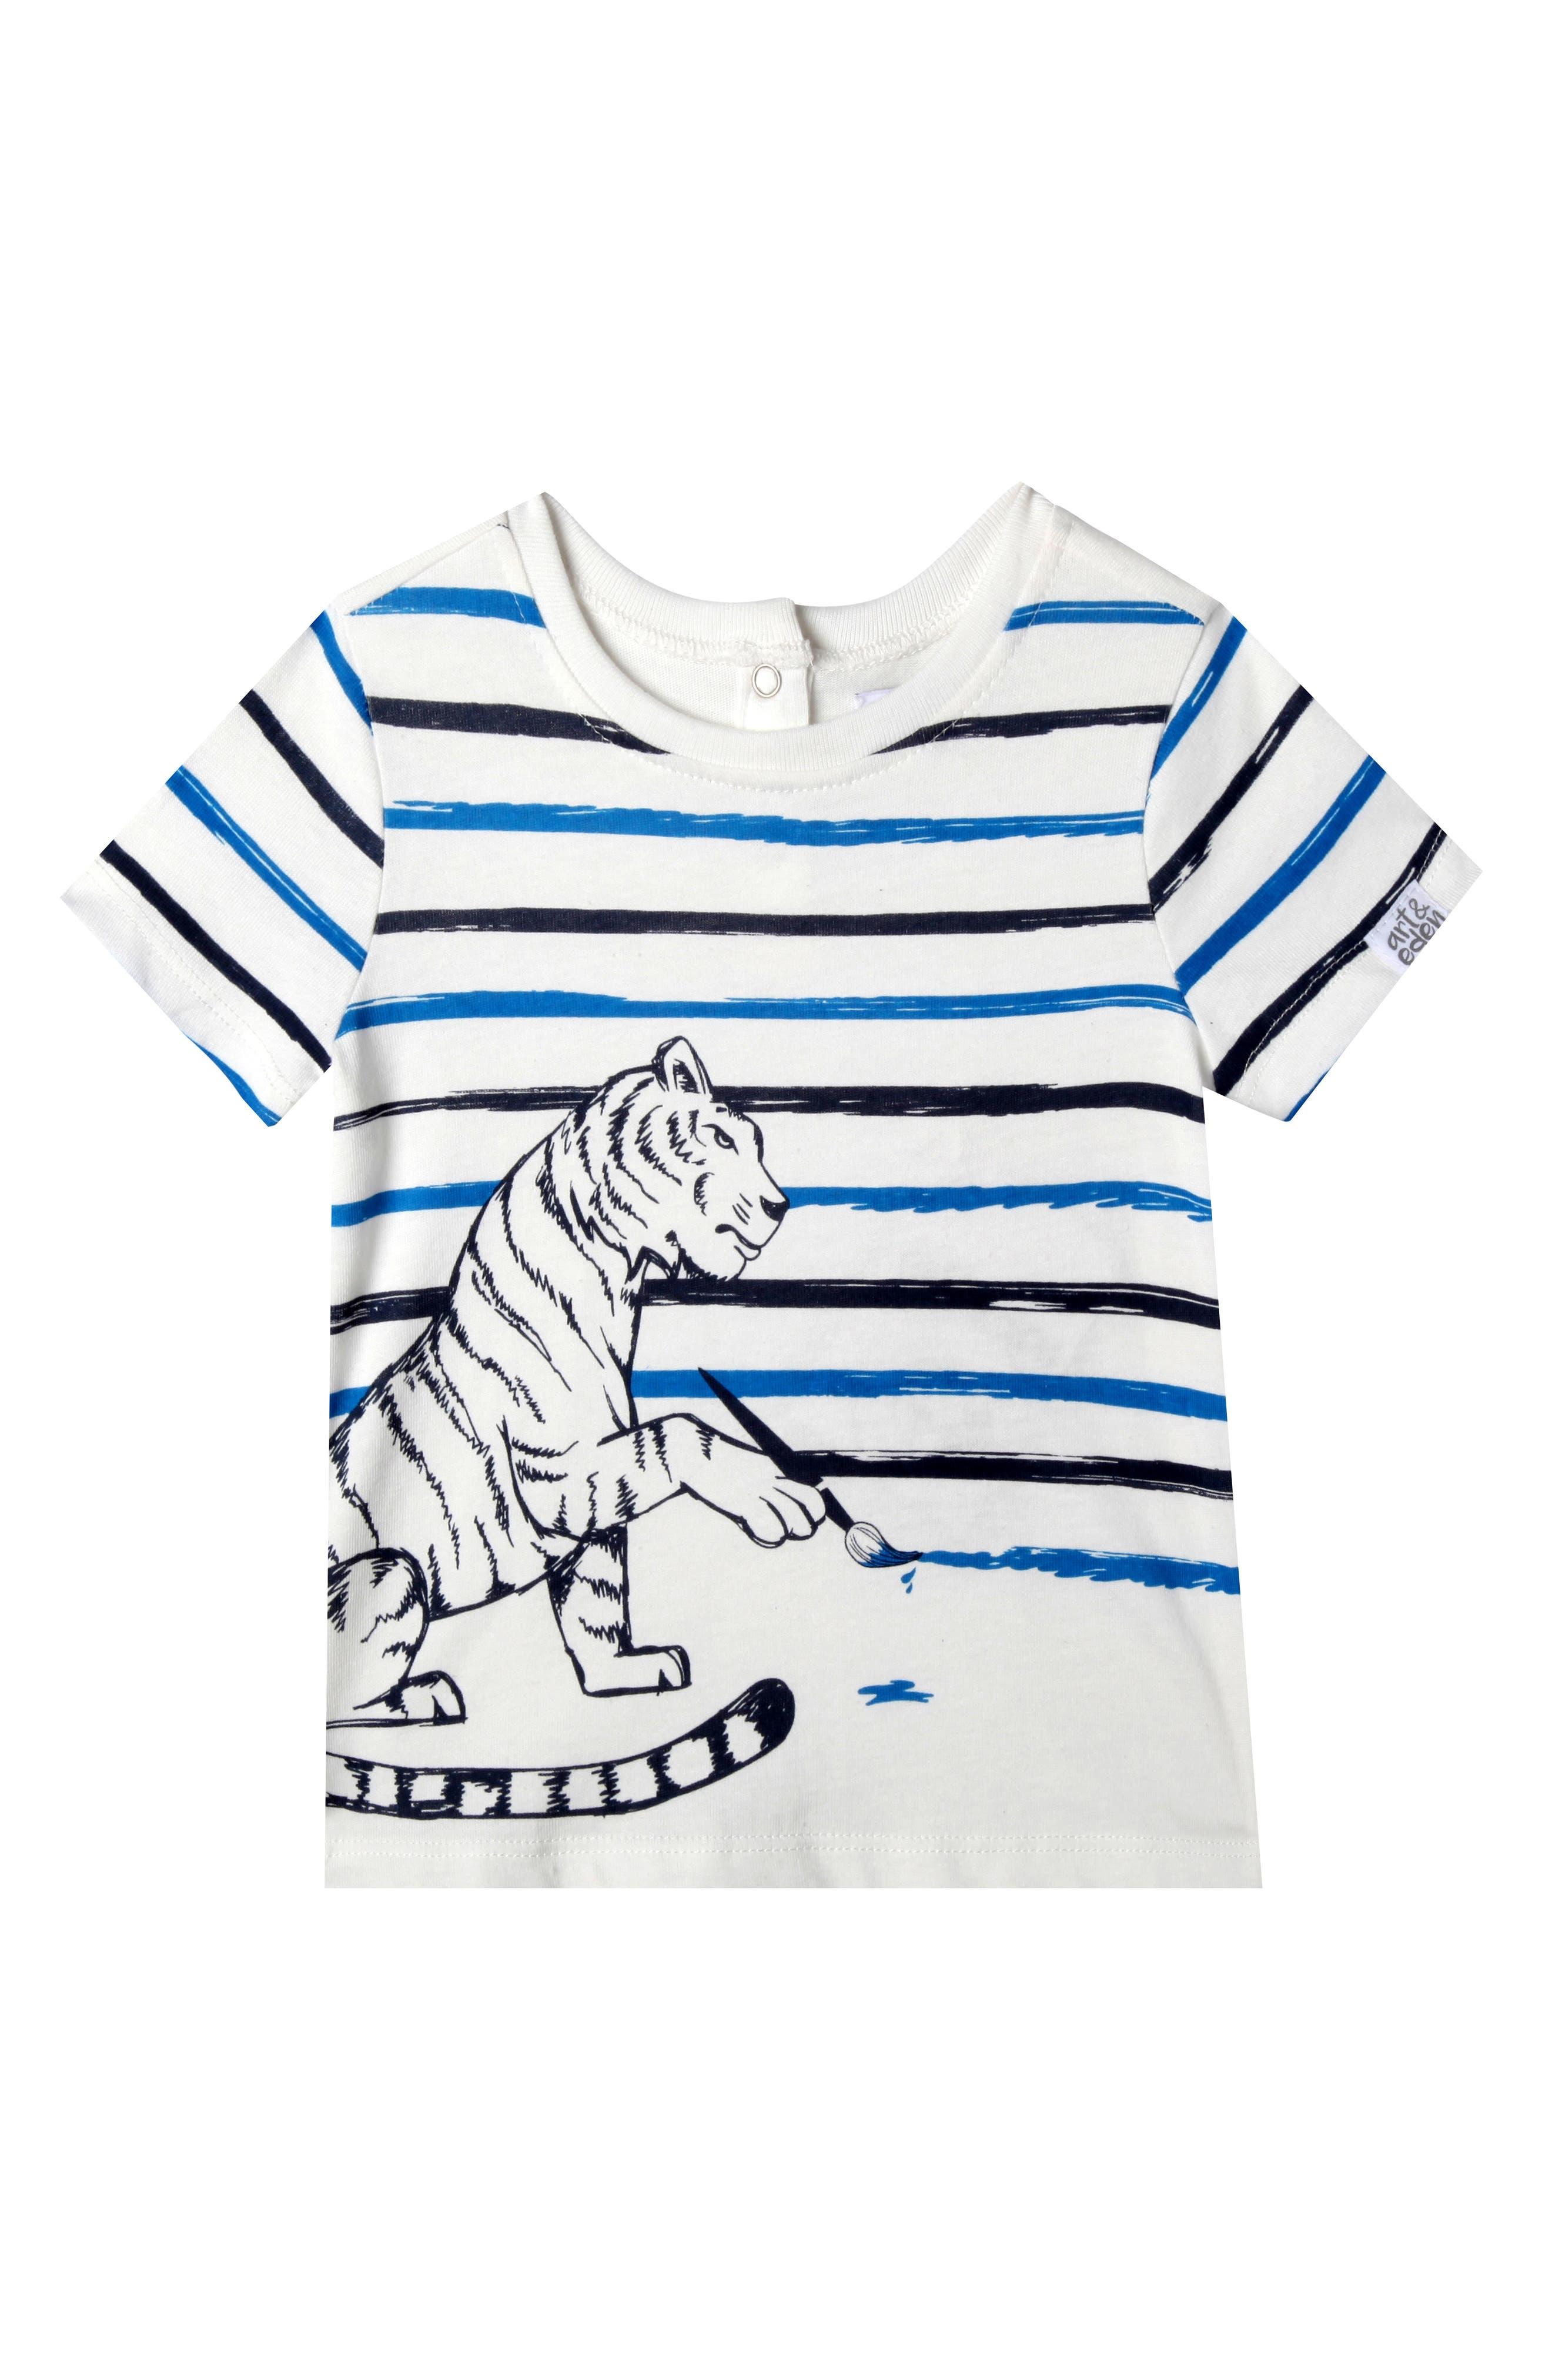 Alternate Image 1 Selected - Art & Eden Caleb T-Shirt (Baby Boys)